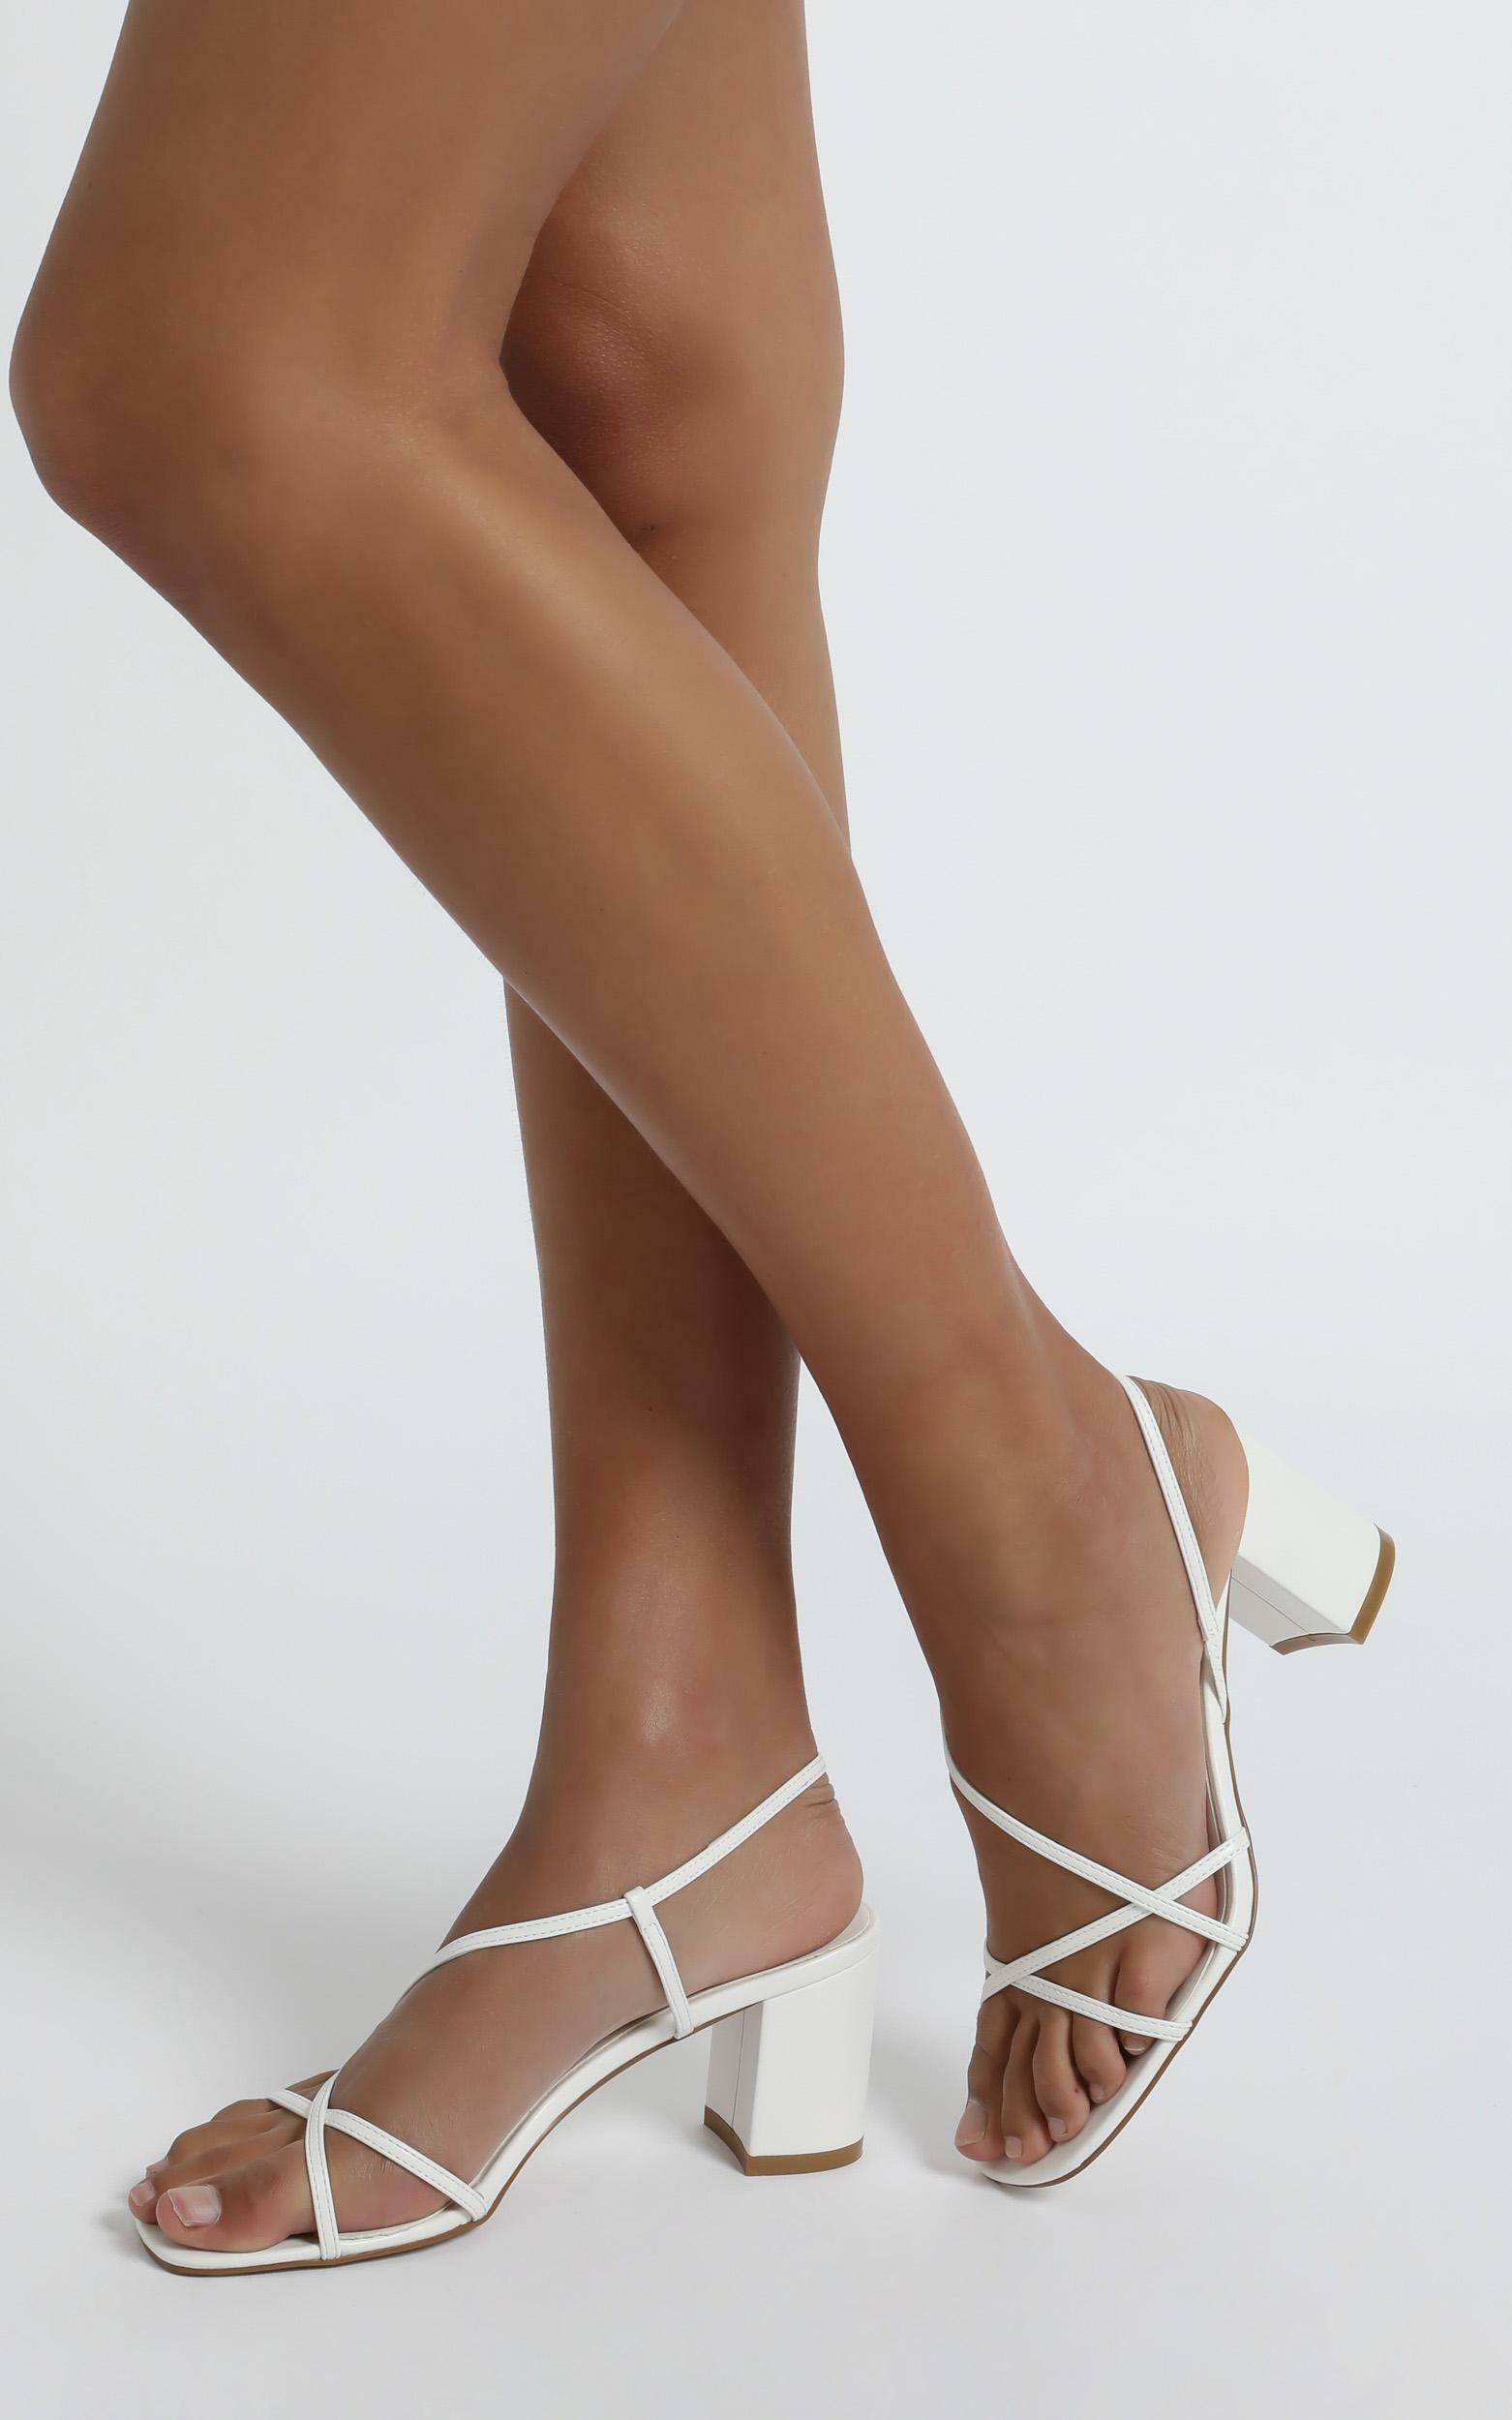 Billini - Yarra Heels in White - 5, WHT1, hi-res image number null